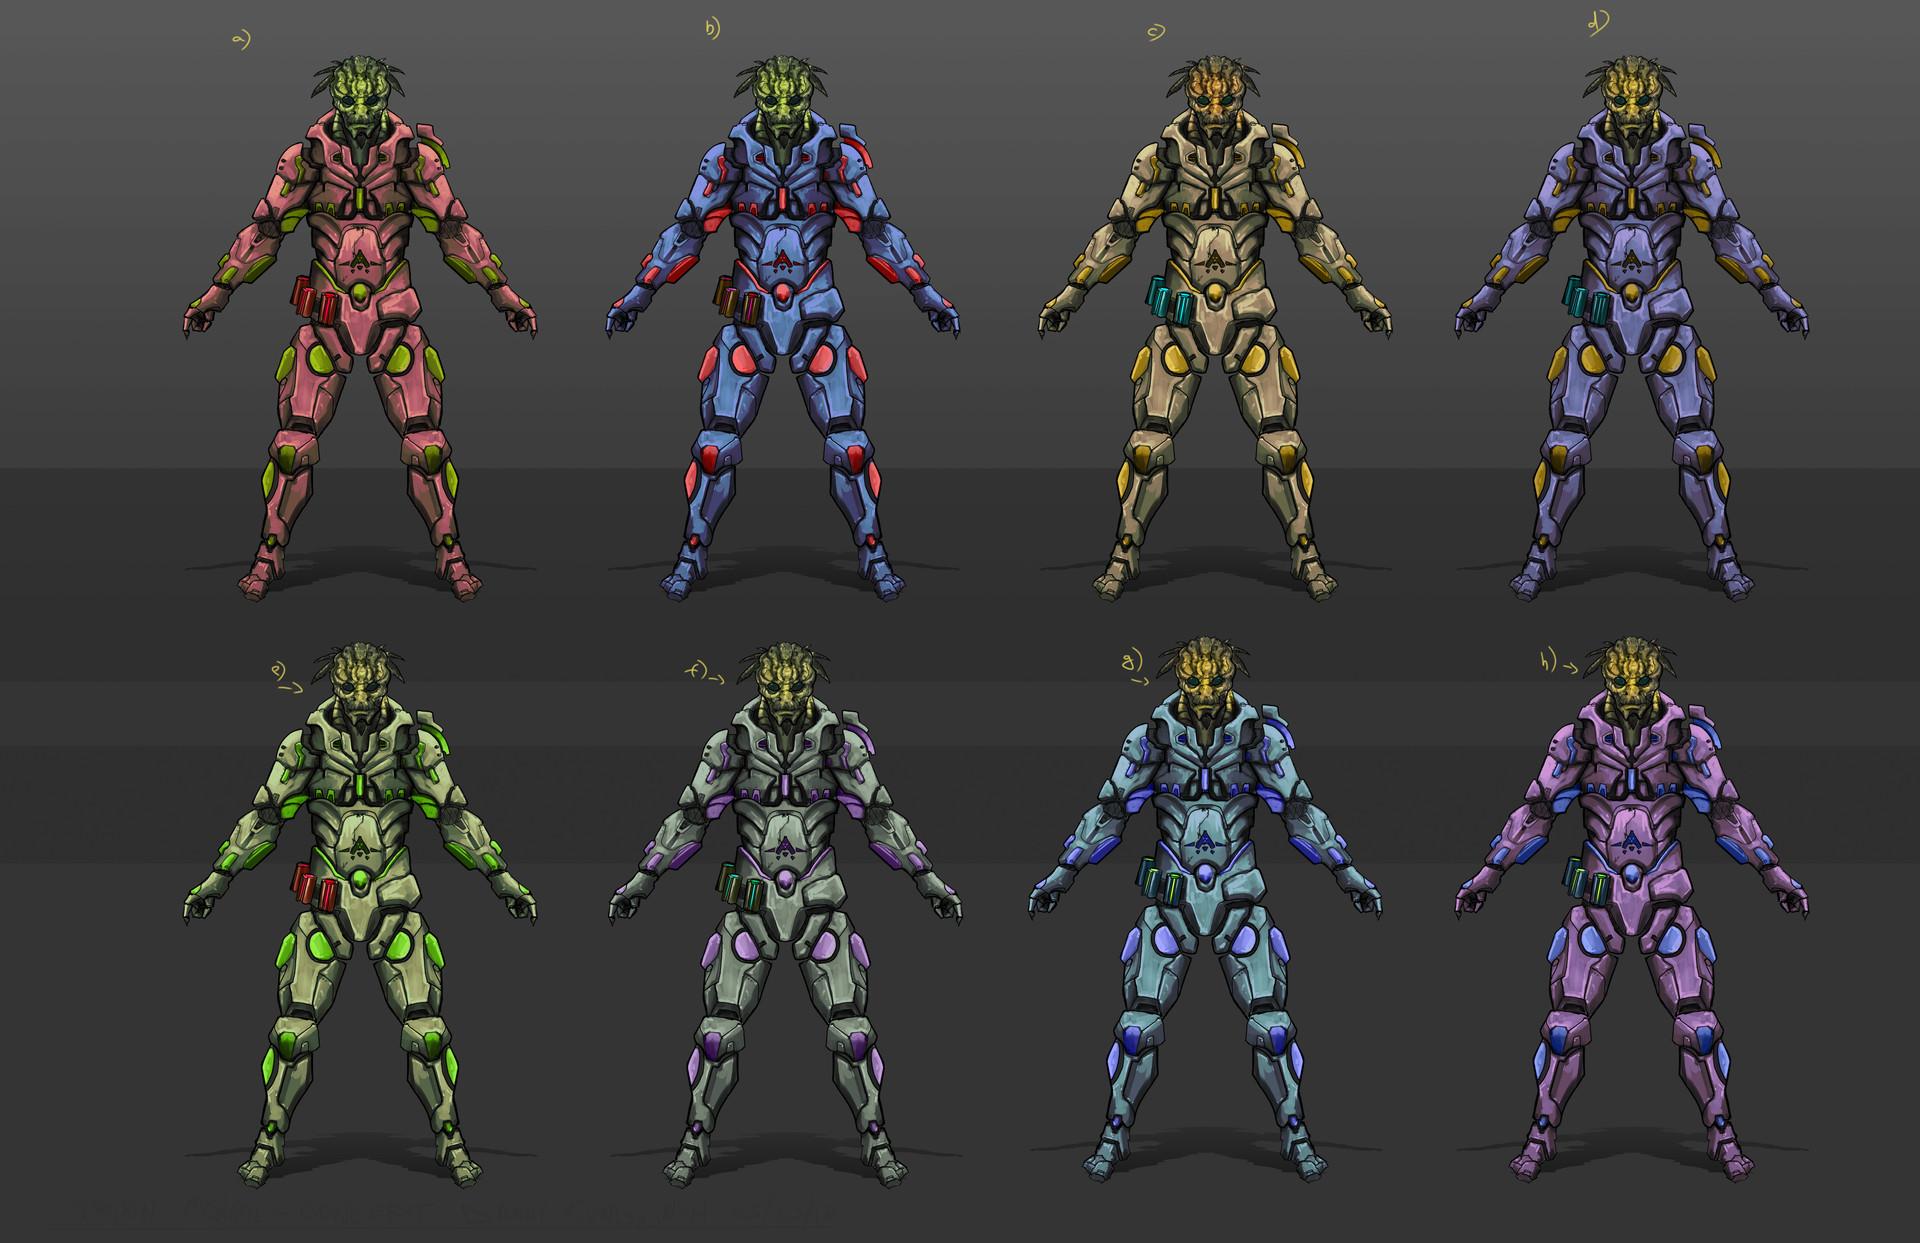 Danny kundzinsh vrinn mongol character concept art3 color variations